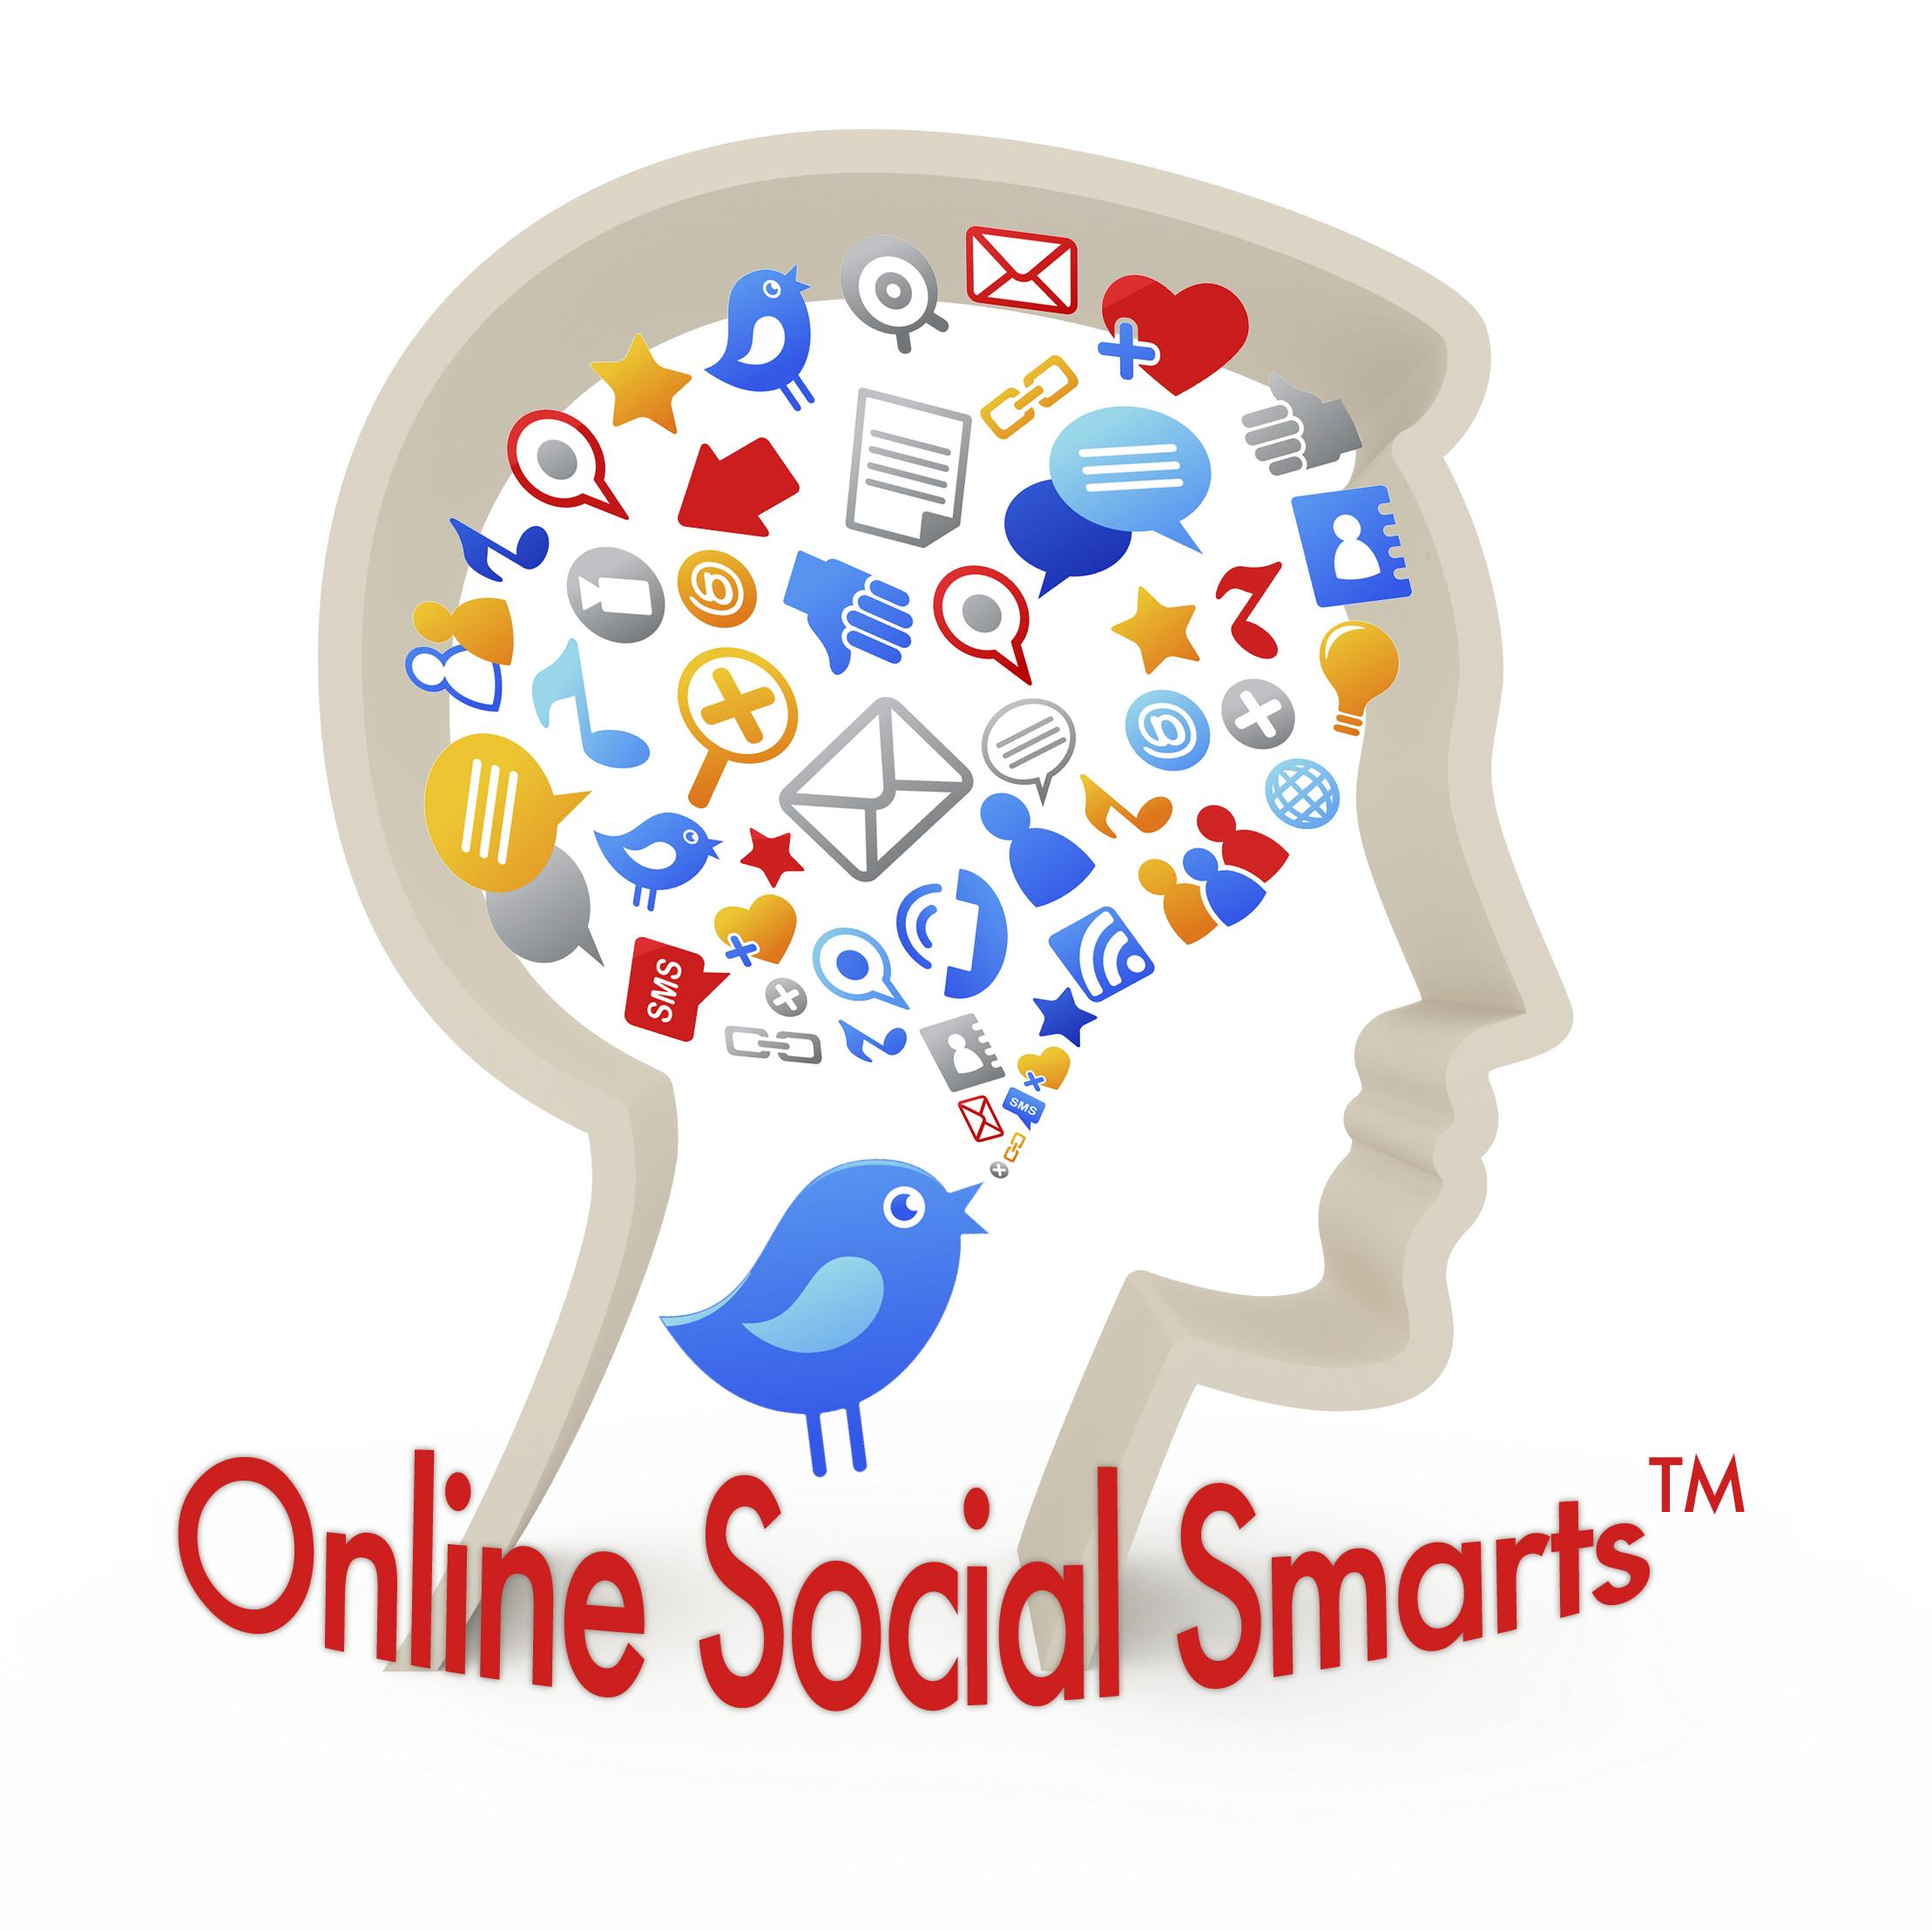 Online Social Smarts